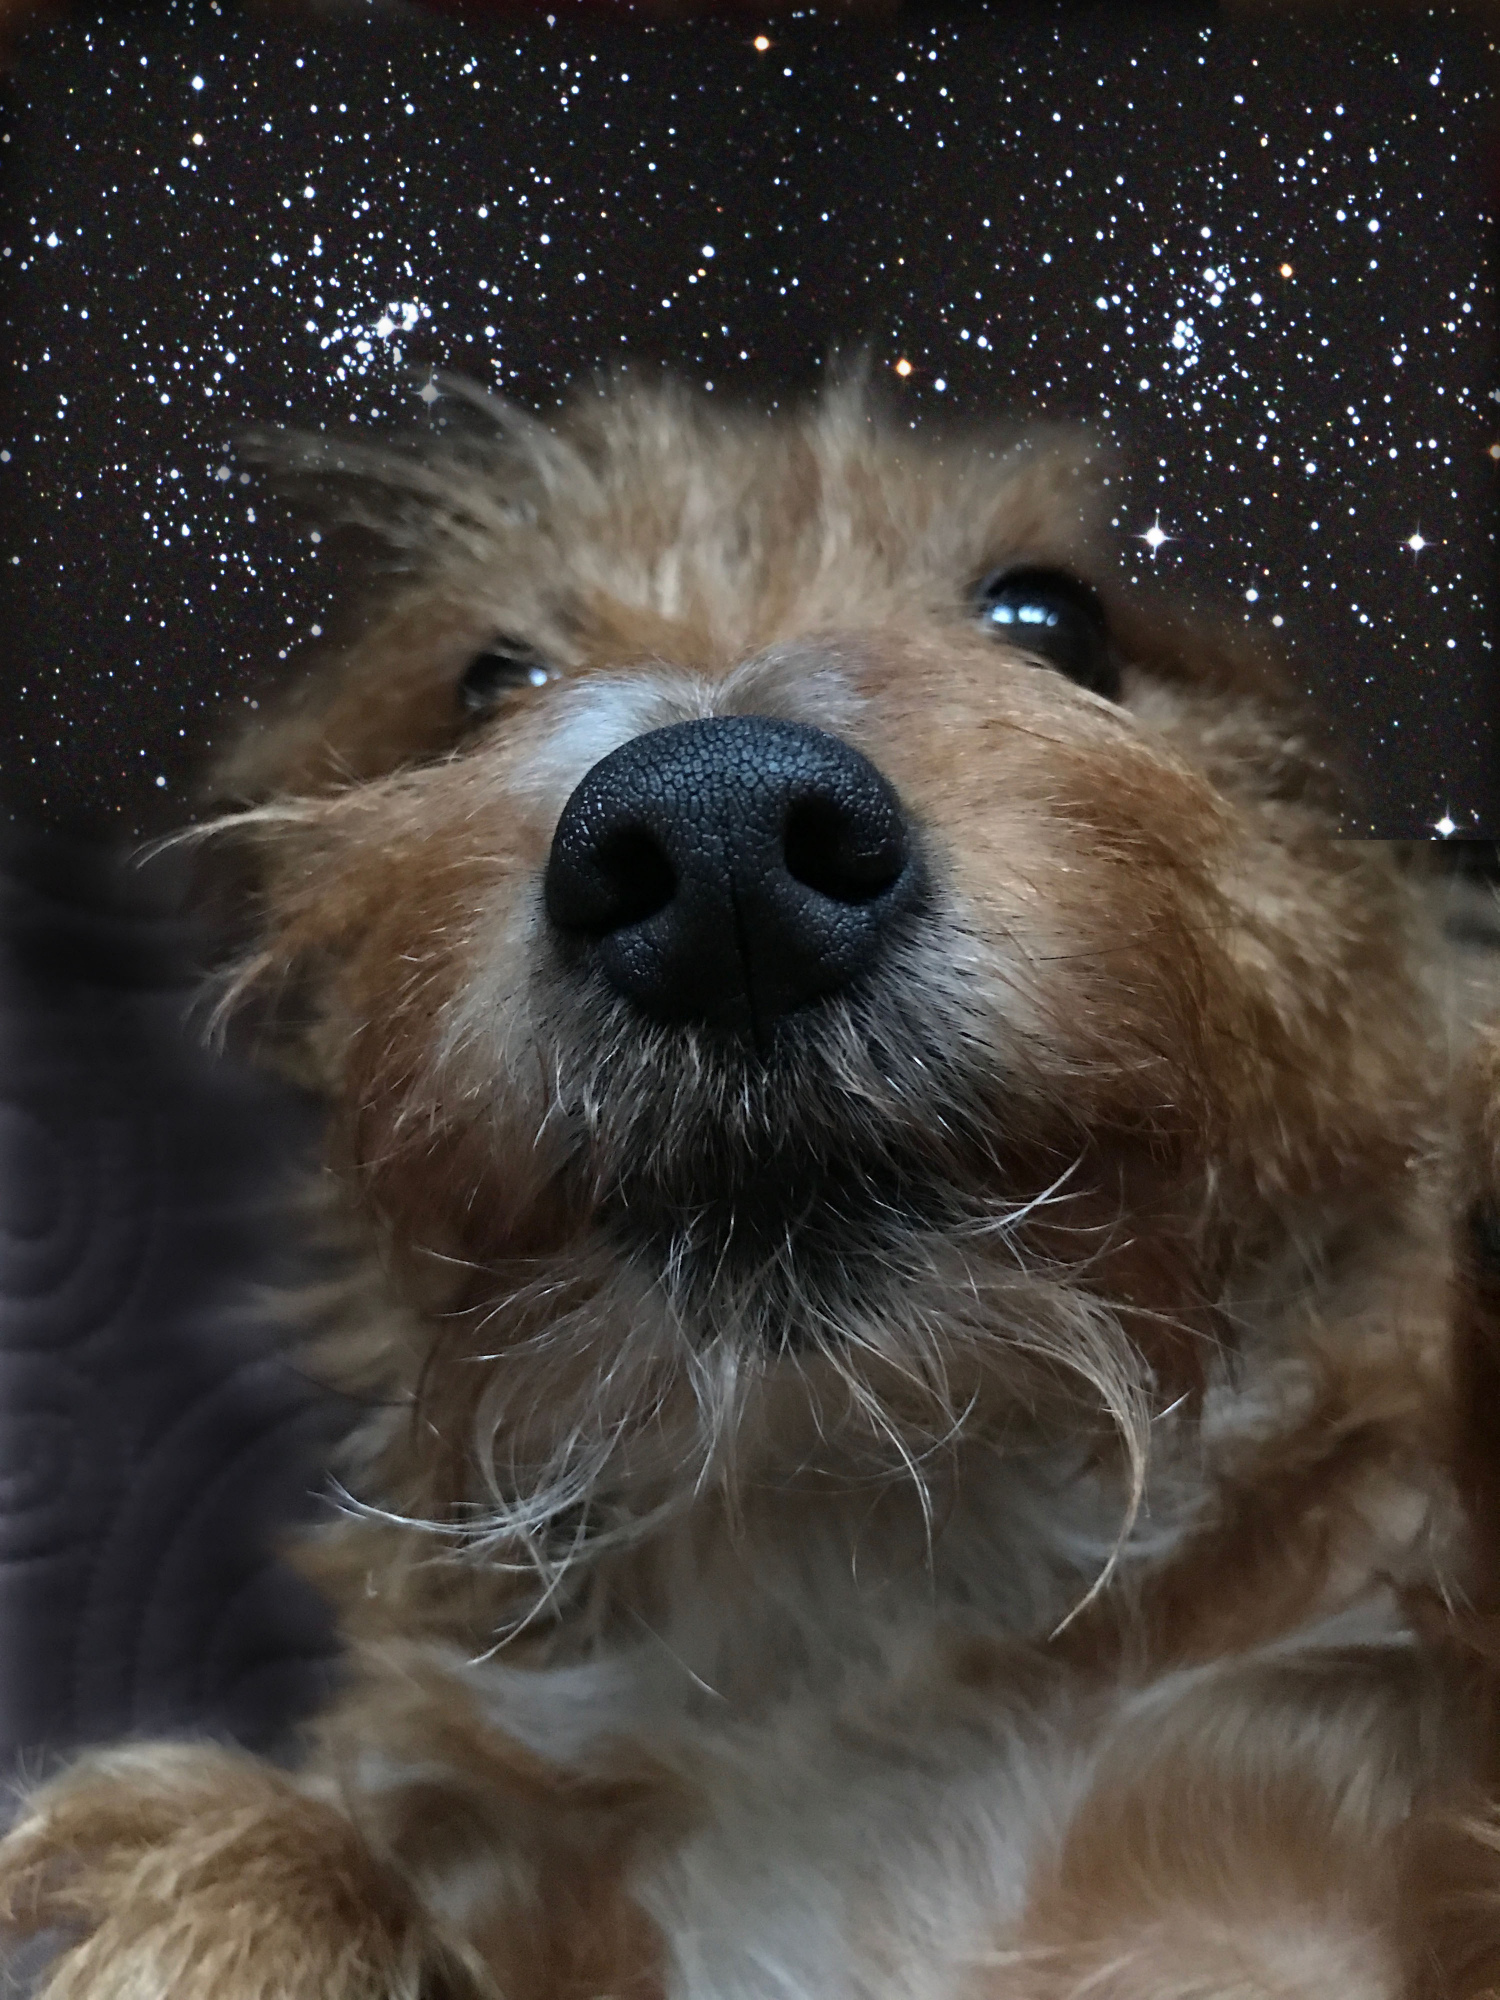 Chien galactique 2 7858 send.jpg